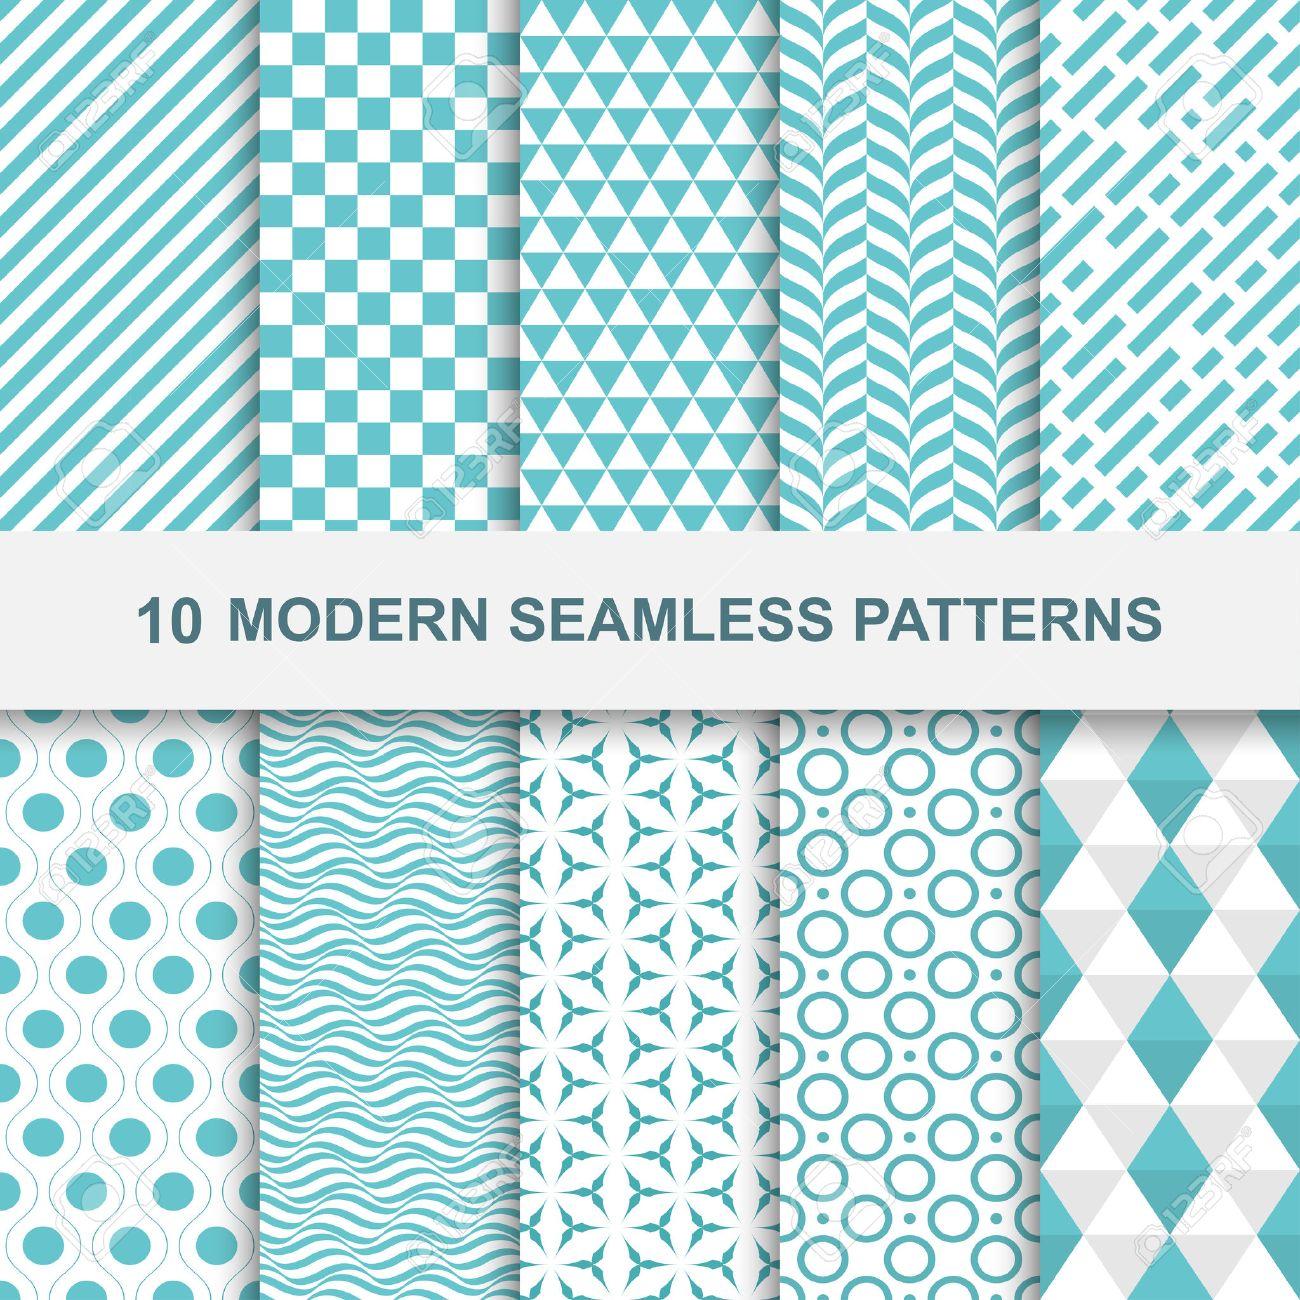 10 Modern seamless geometric patterns. Decorative green textures. - 52023700